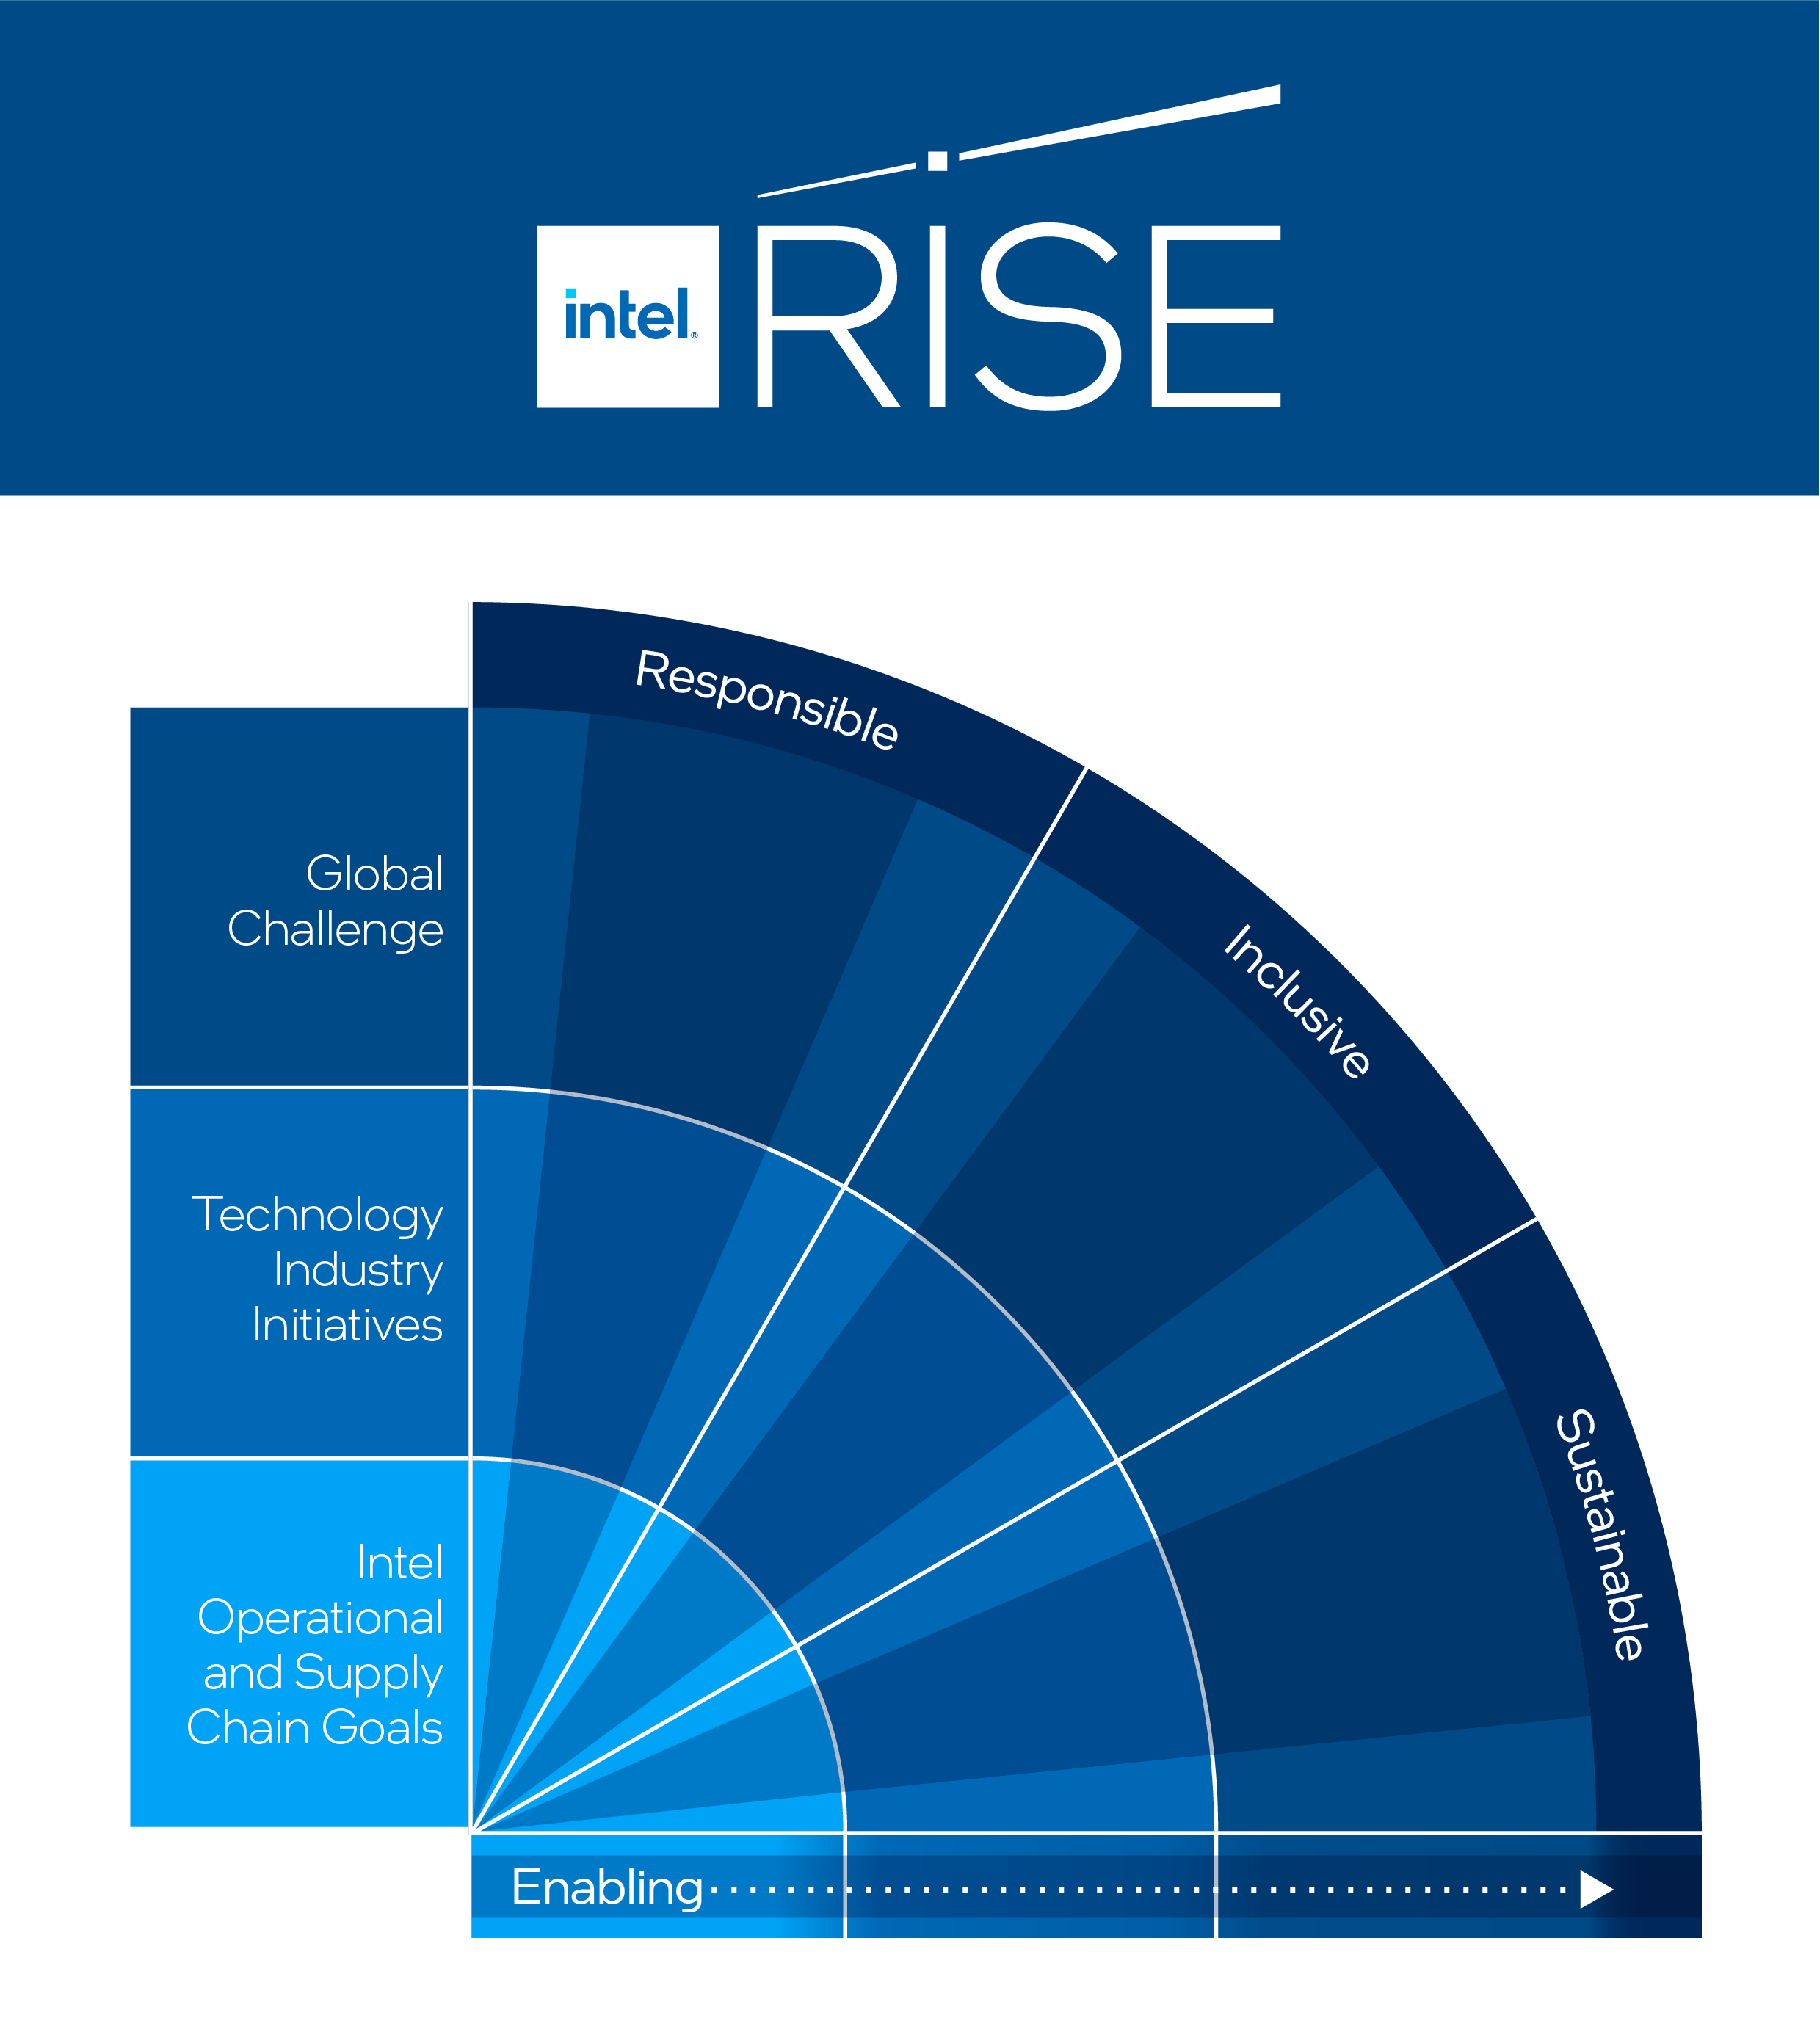 Rise graphic